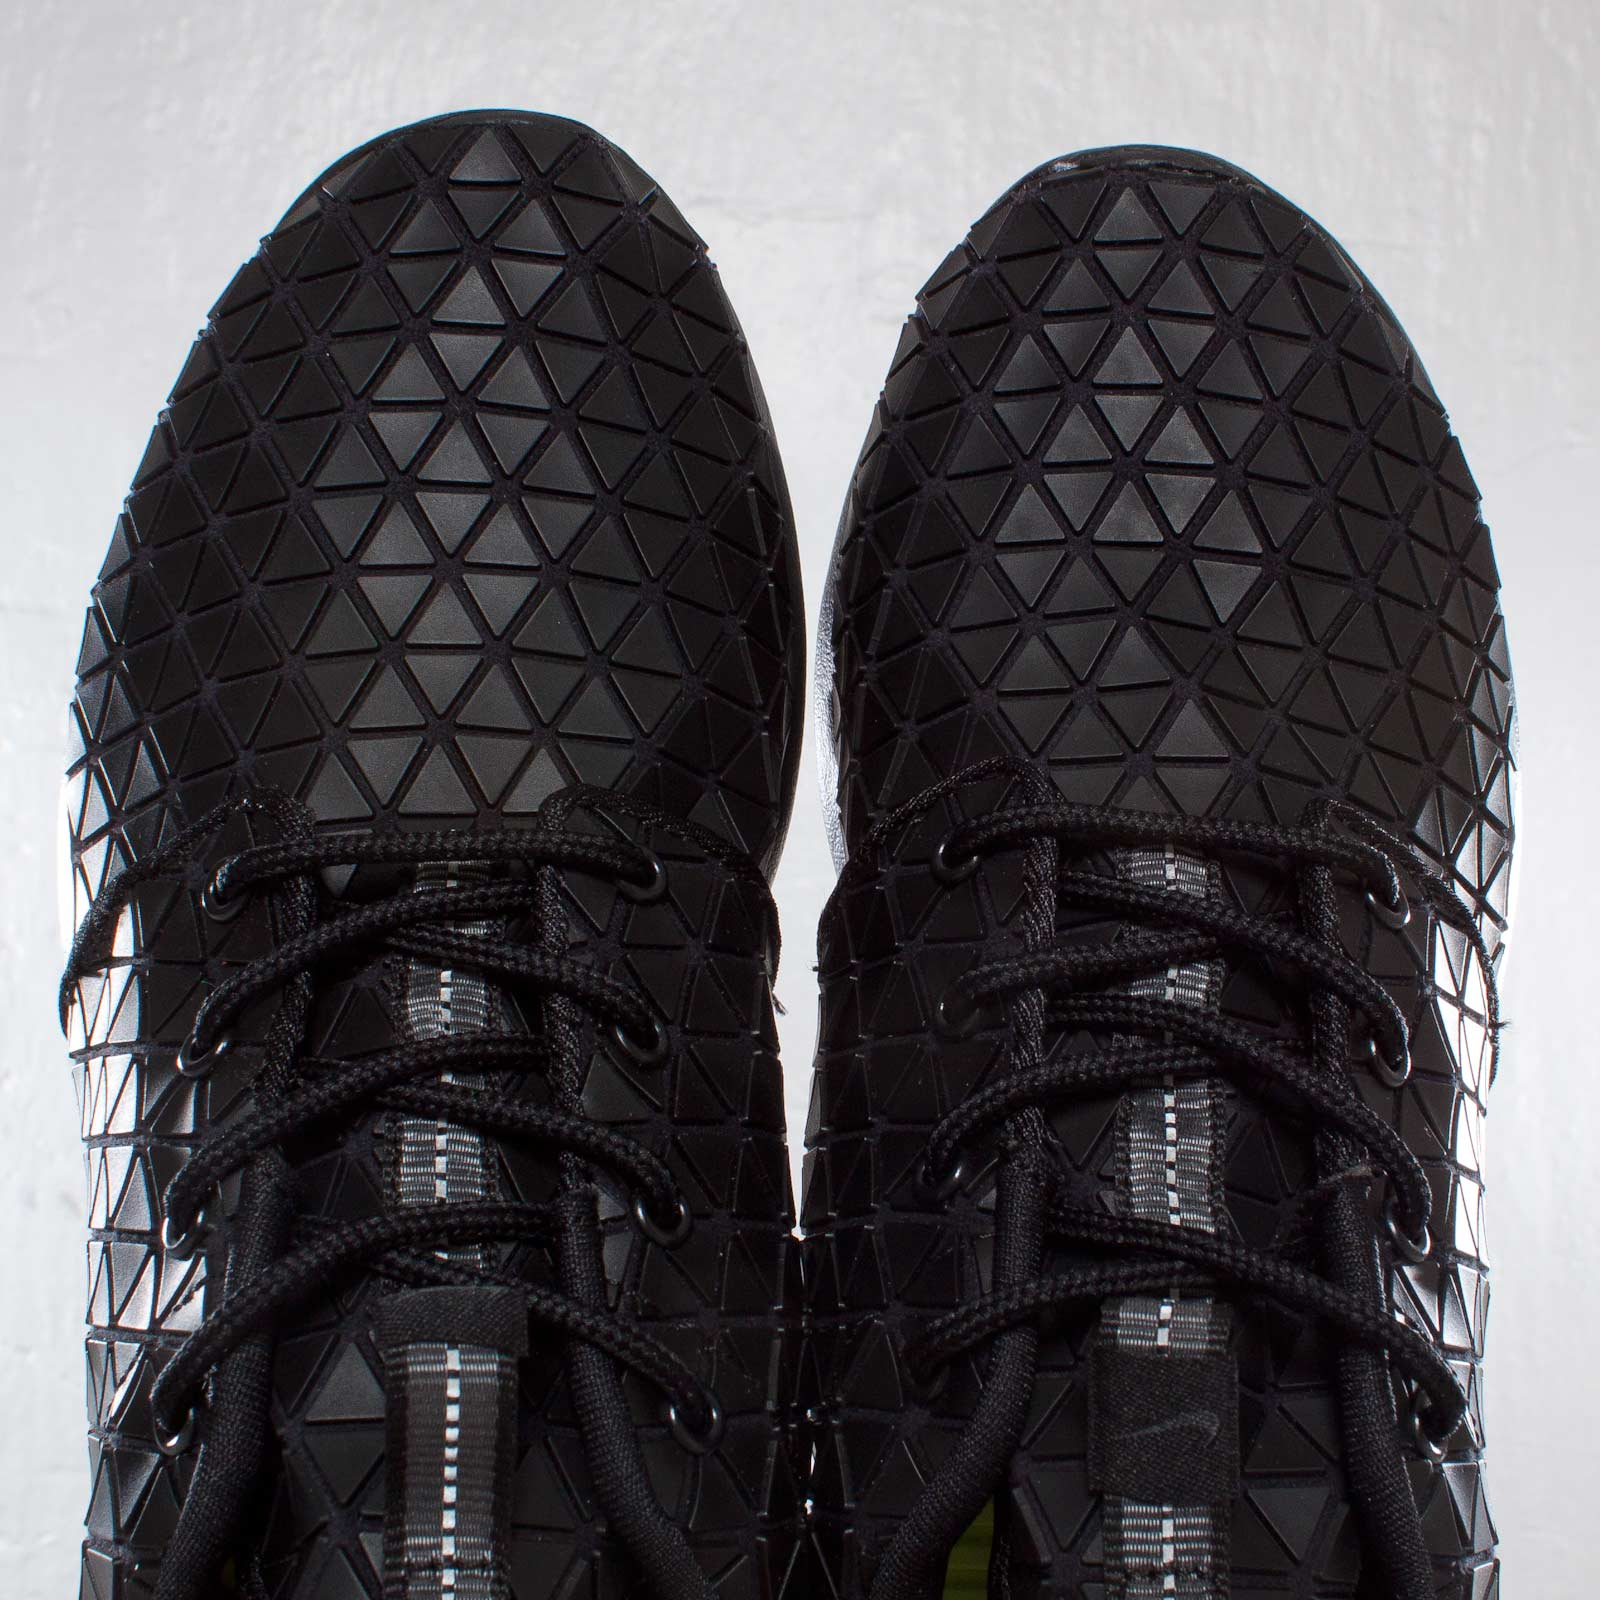 new arrival 7381d 1c523 Nike Wmns Roshe Run Metric QS - 607284-001 - Sneakersnstuff   sneakers    streetwear online since 1999